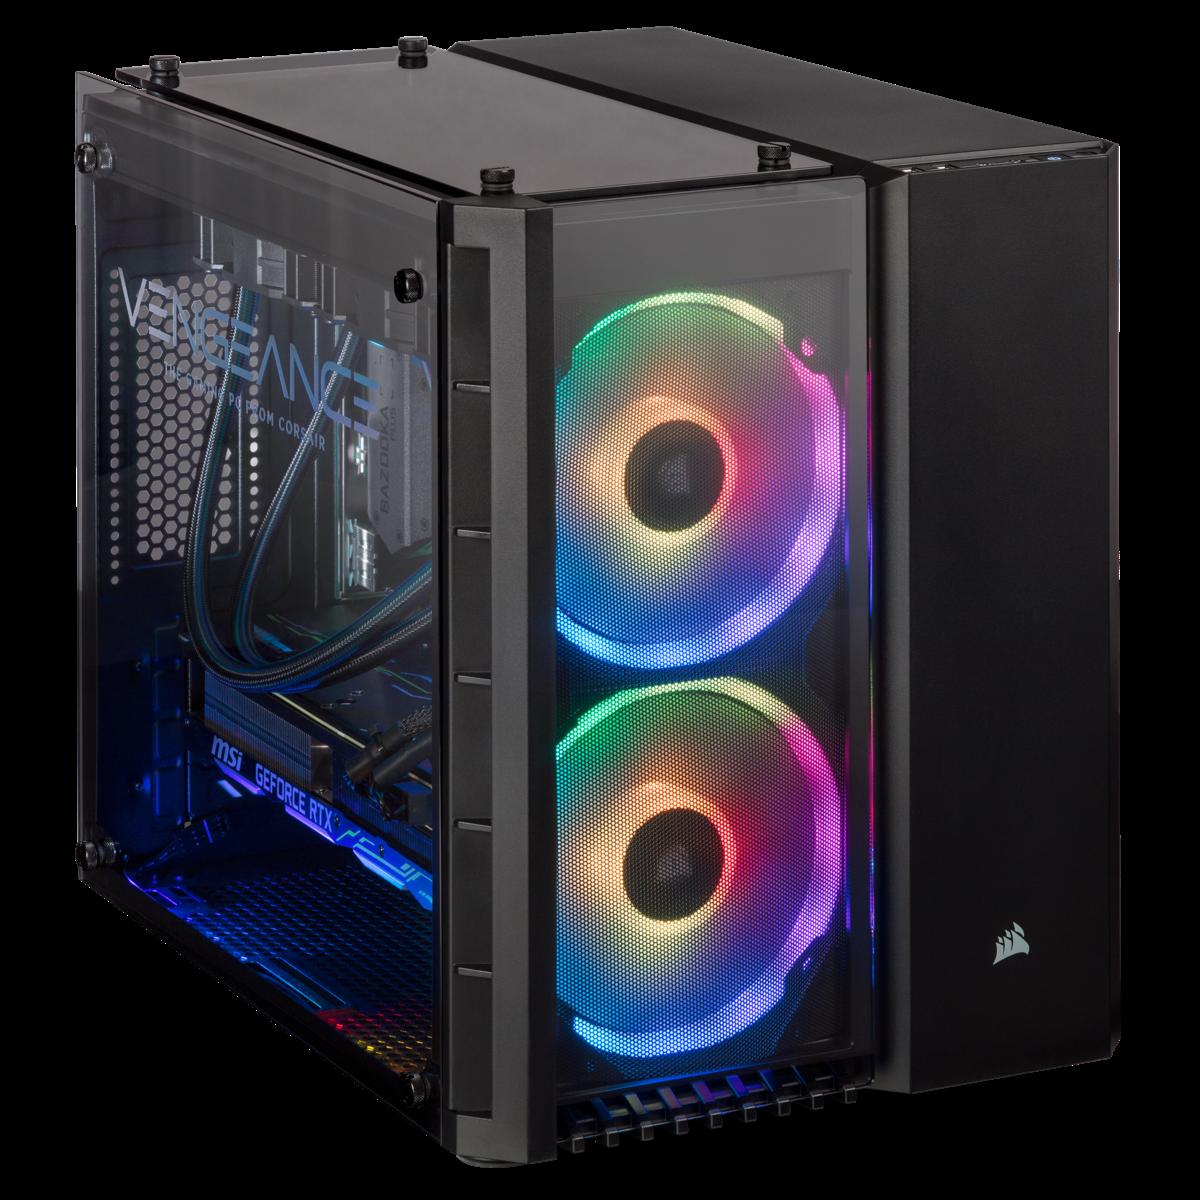 Vengeance 5180 Gaming PC